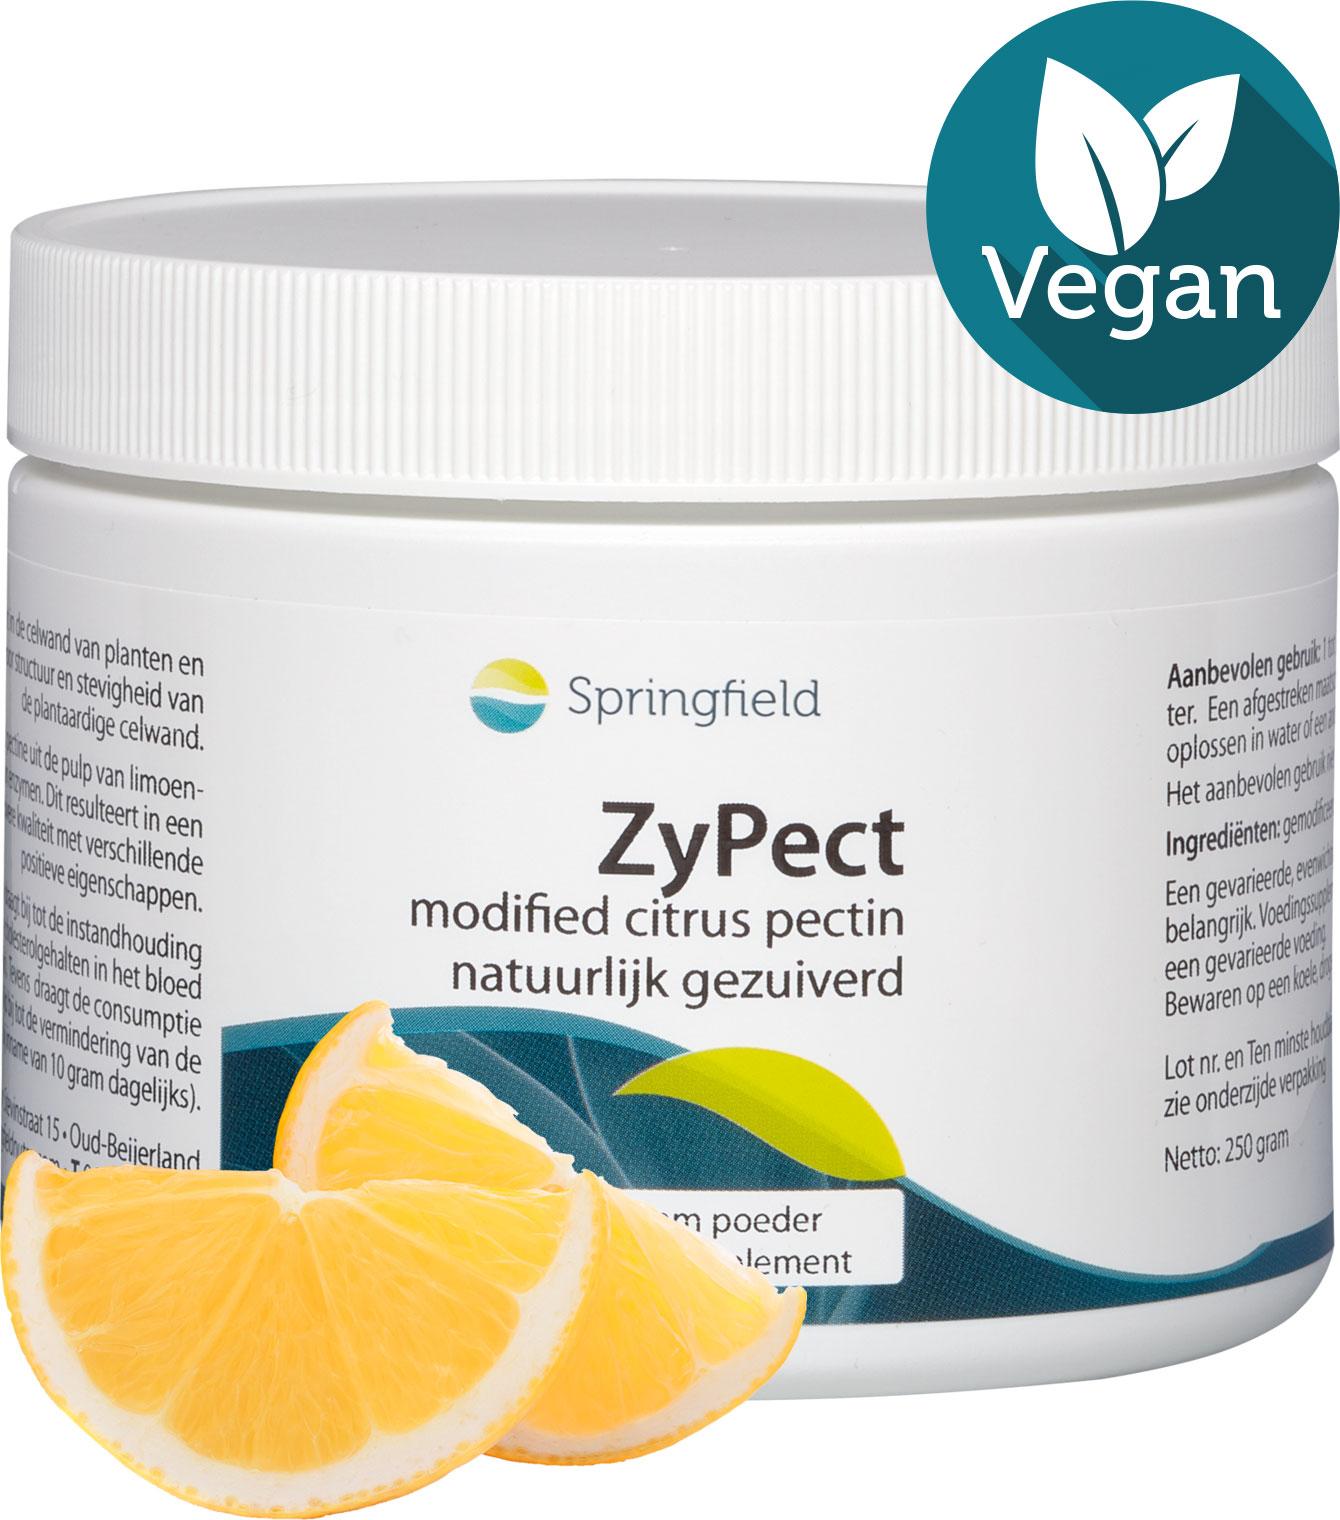 Zypect-gemodificeerde-citrus-pectine-citroenen-250g-vegan